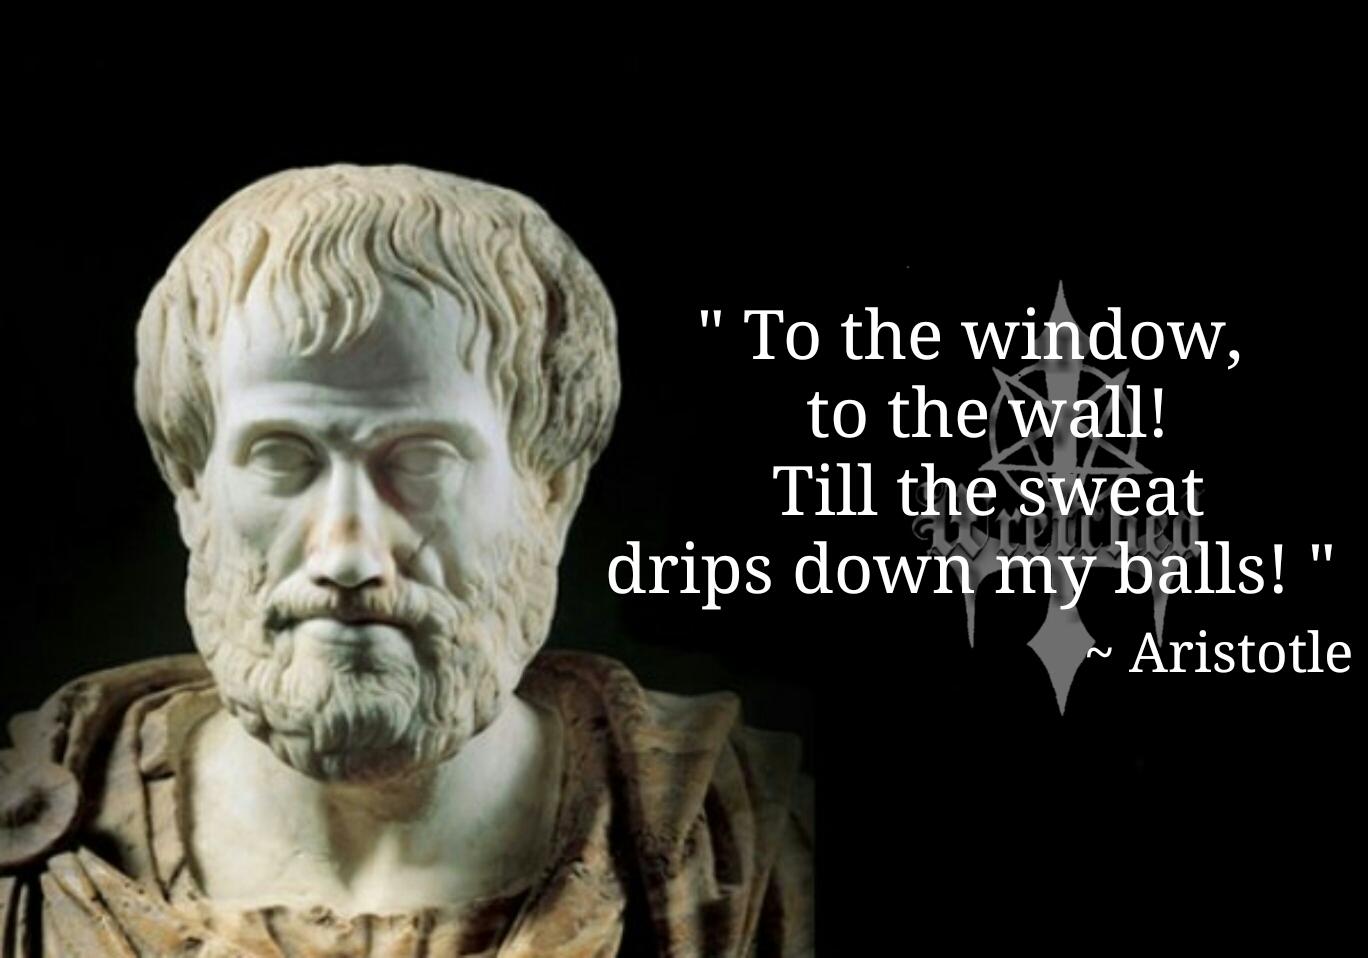 Aristotle memes